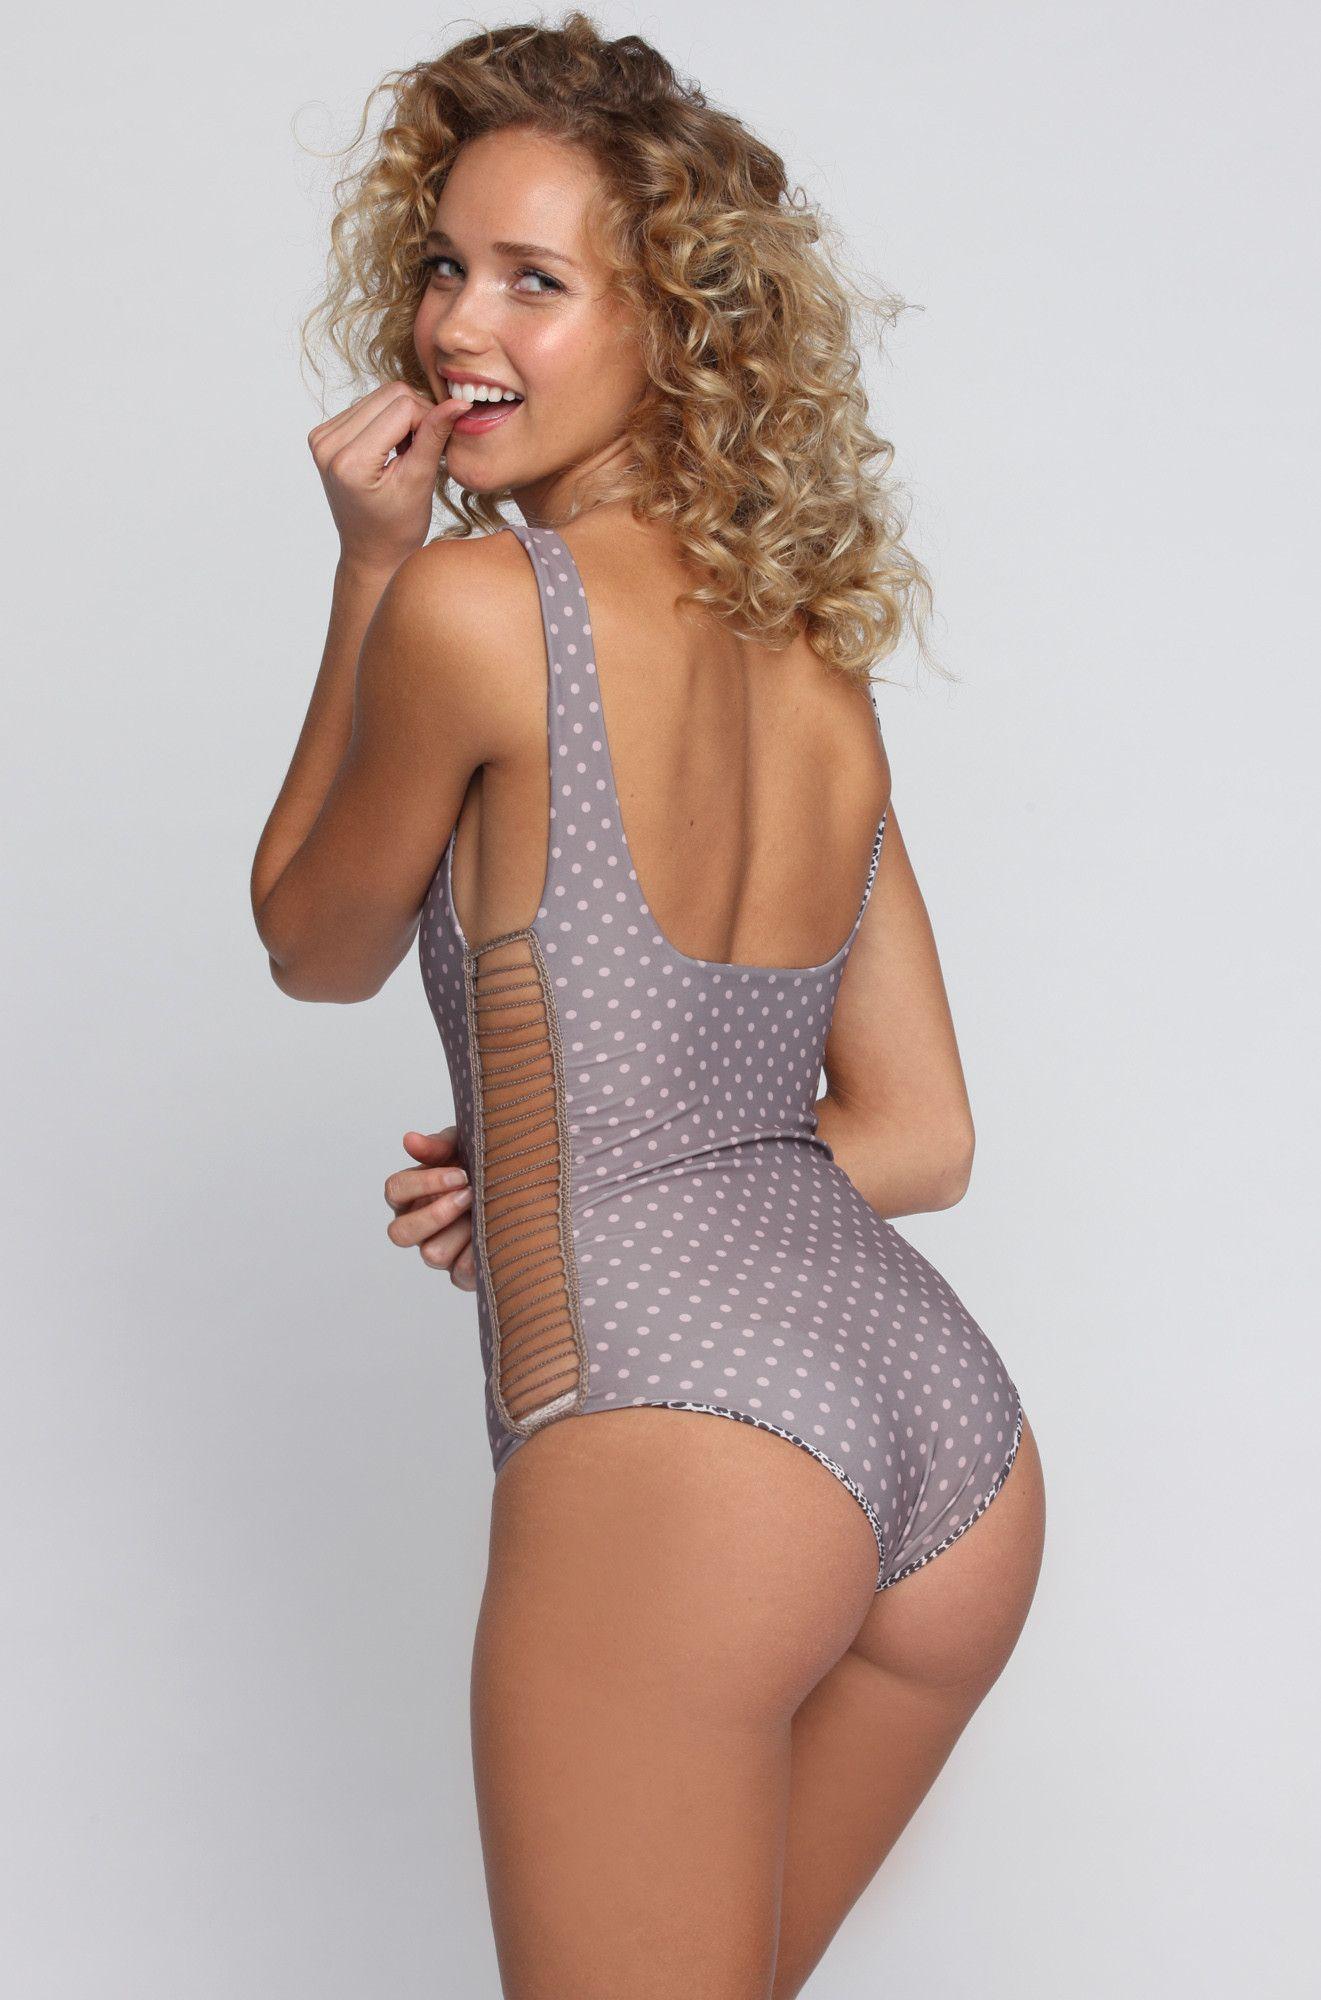 Hot Allie Silva naked (13 photos), Pussy, Sideboobs, Instagram, bra 2020